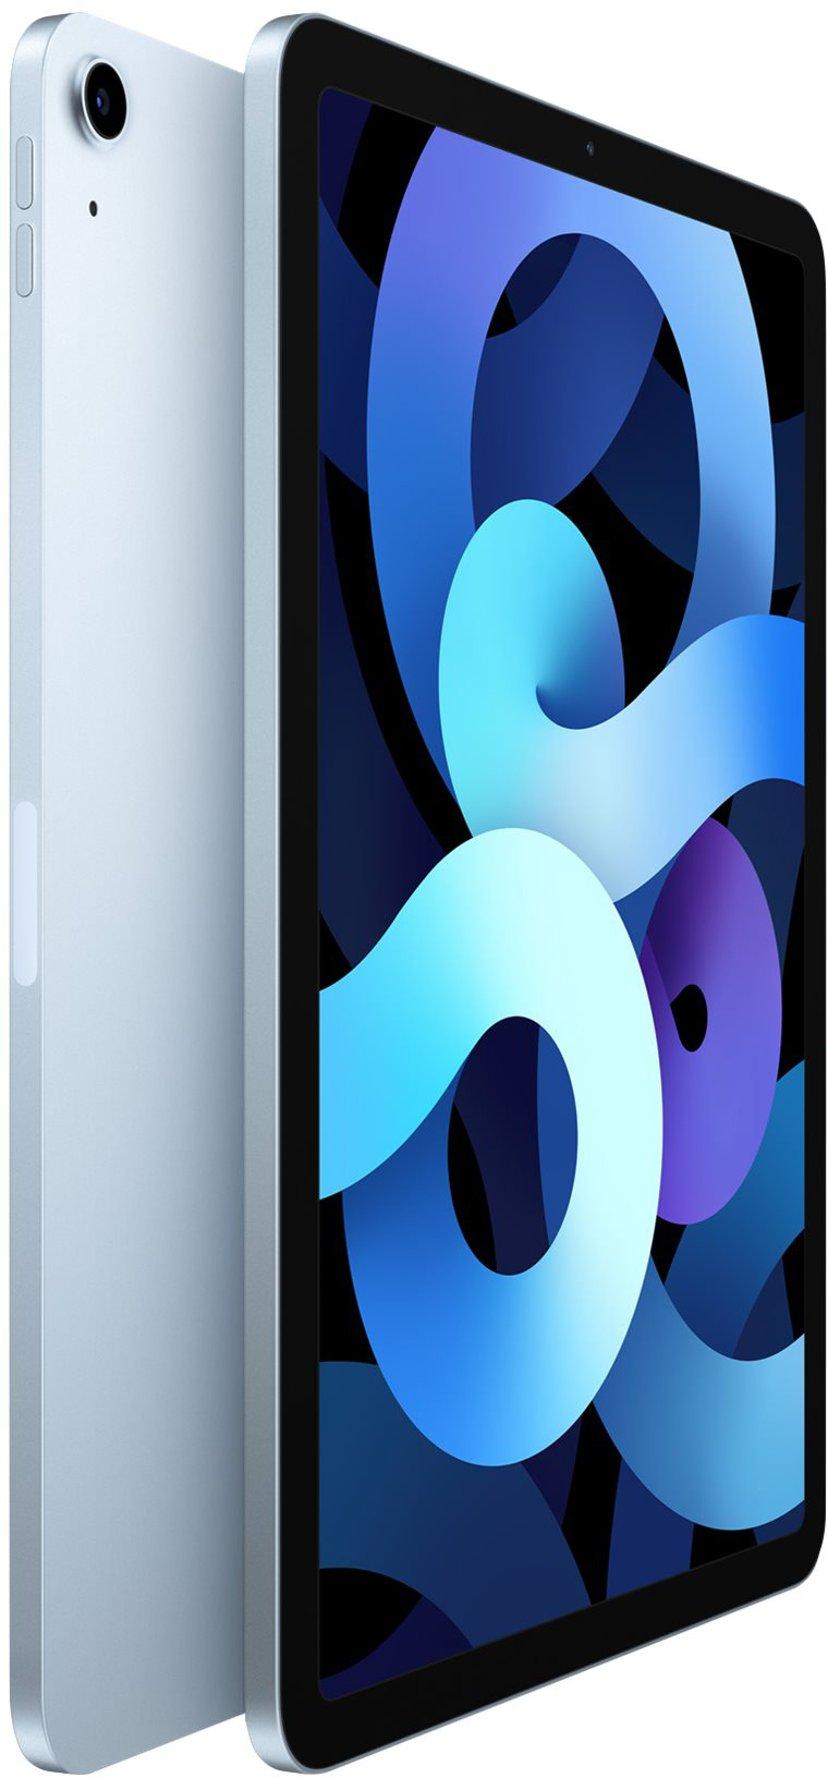 "Apple iPad Air 4th gen (2020) WiFi + Cellular 10.9"" A14 Bionic 64GB Taivaansininen"